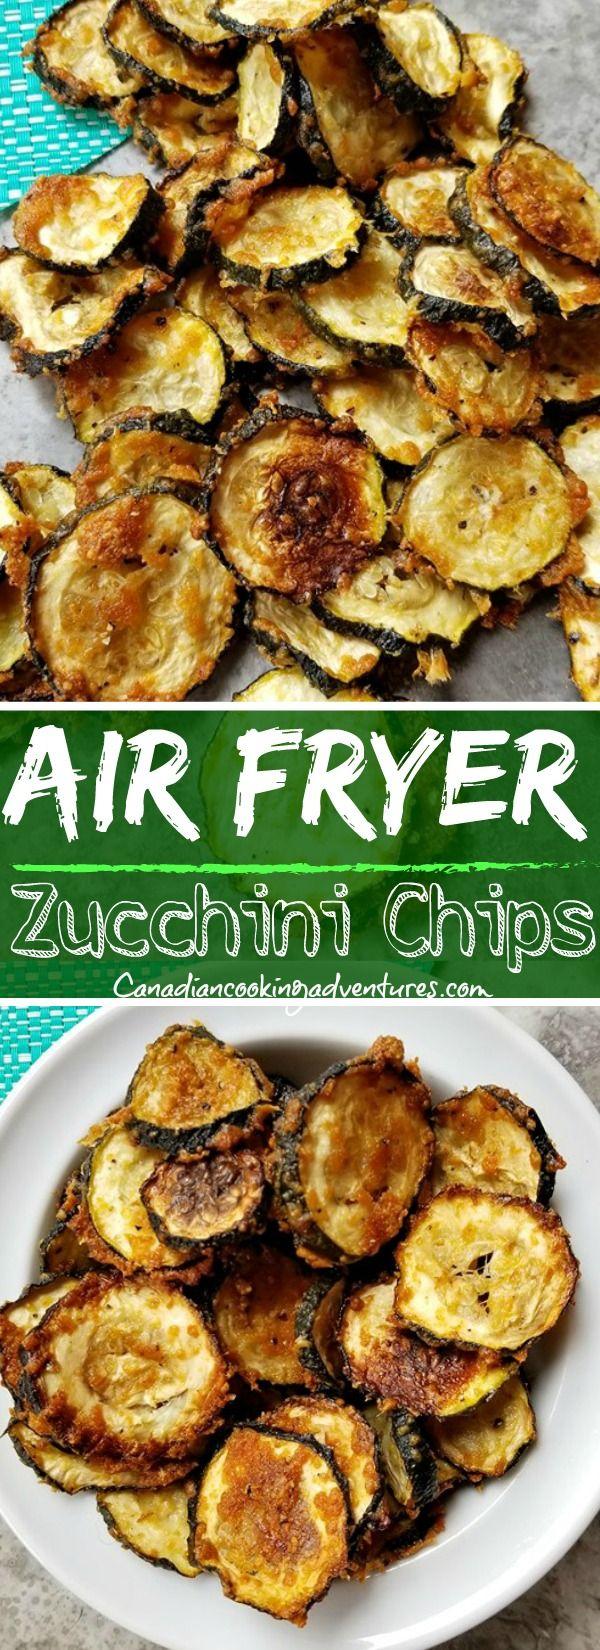 Air Fryer Zucchini Chips #airfryerrecipes